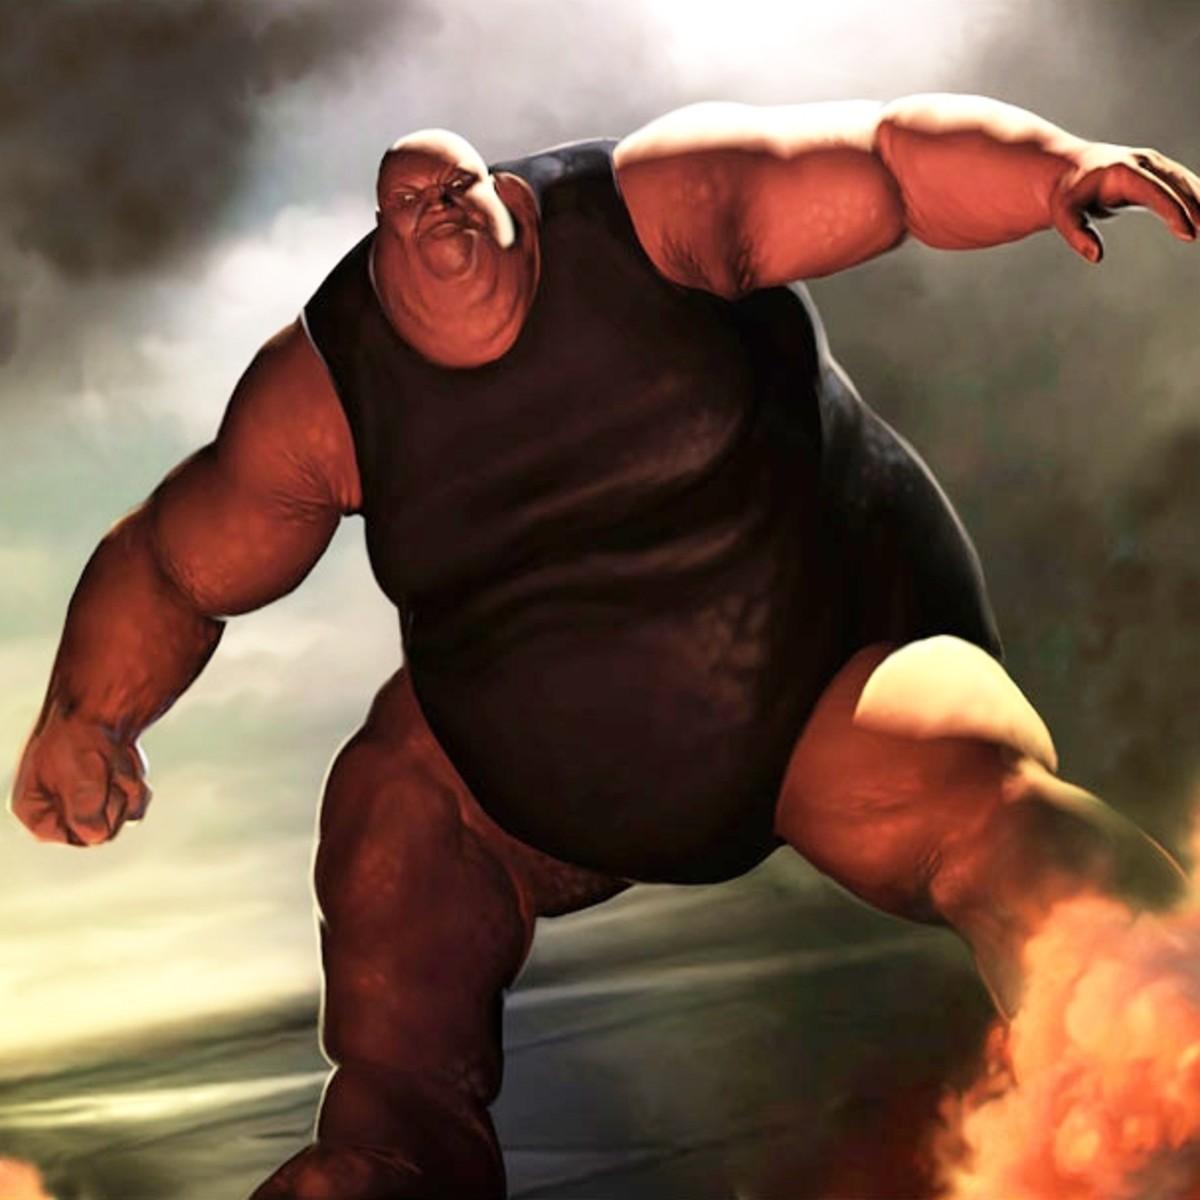 Fred J Dukes - aka The Blob